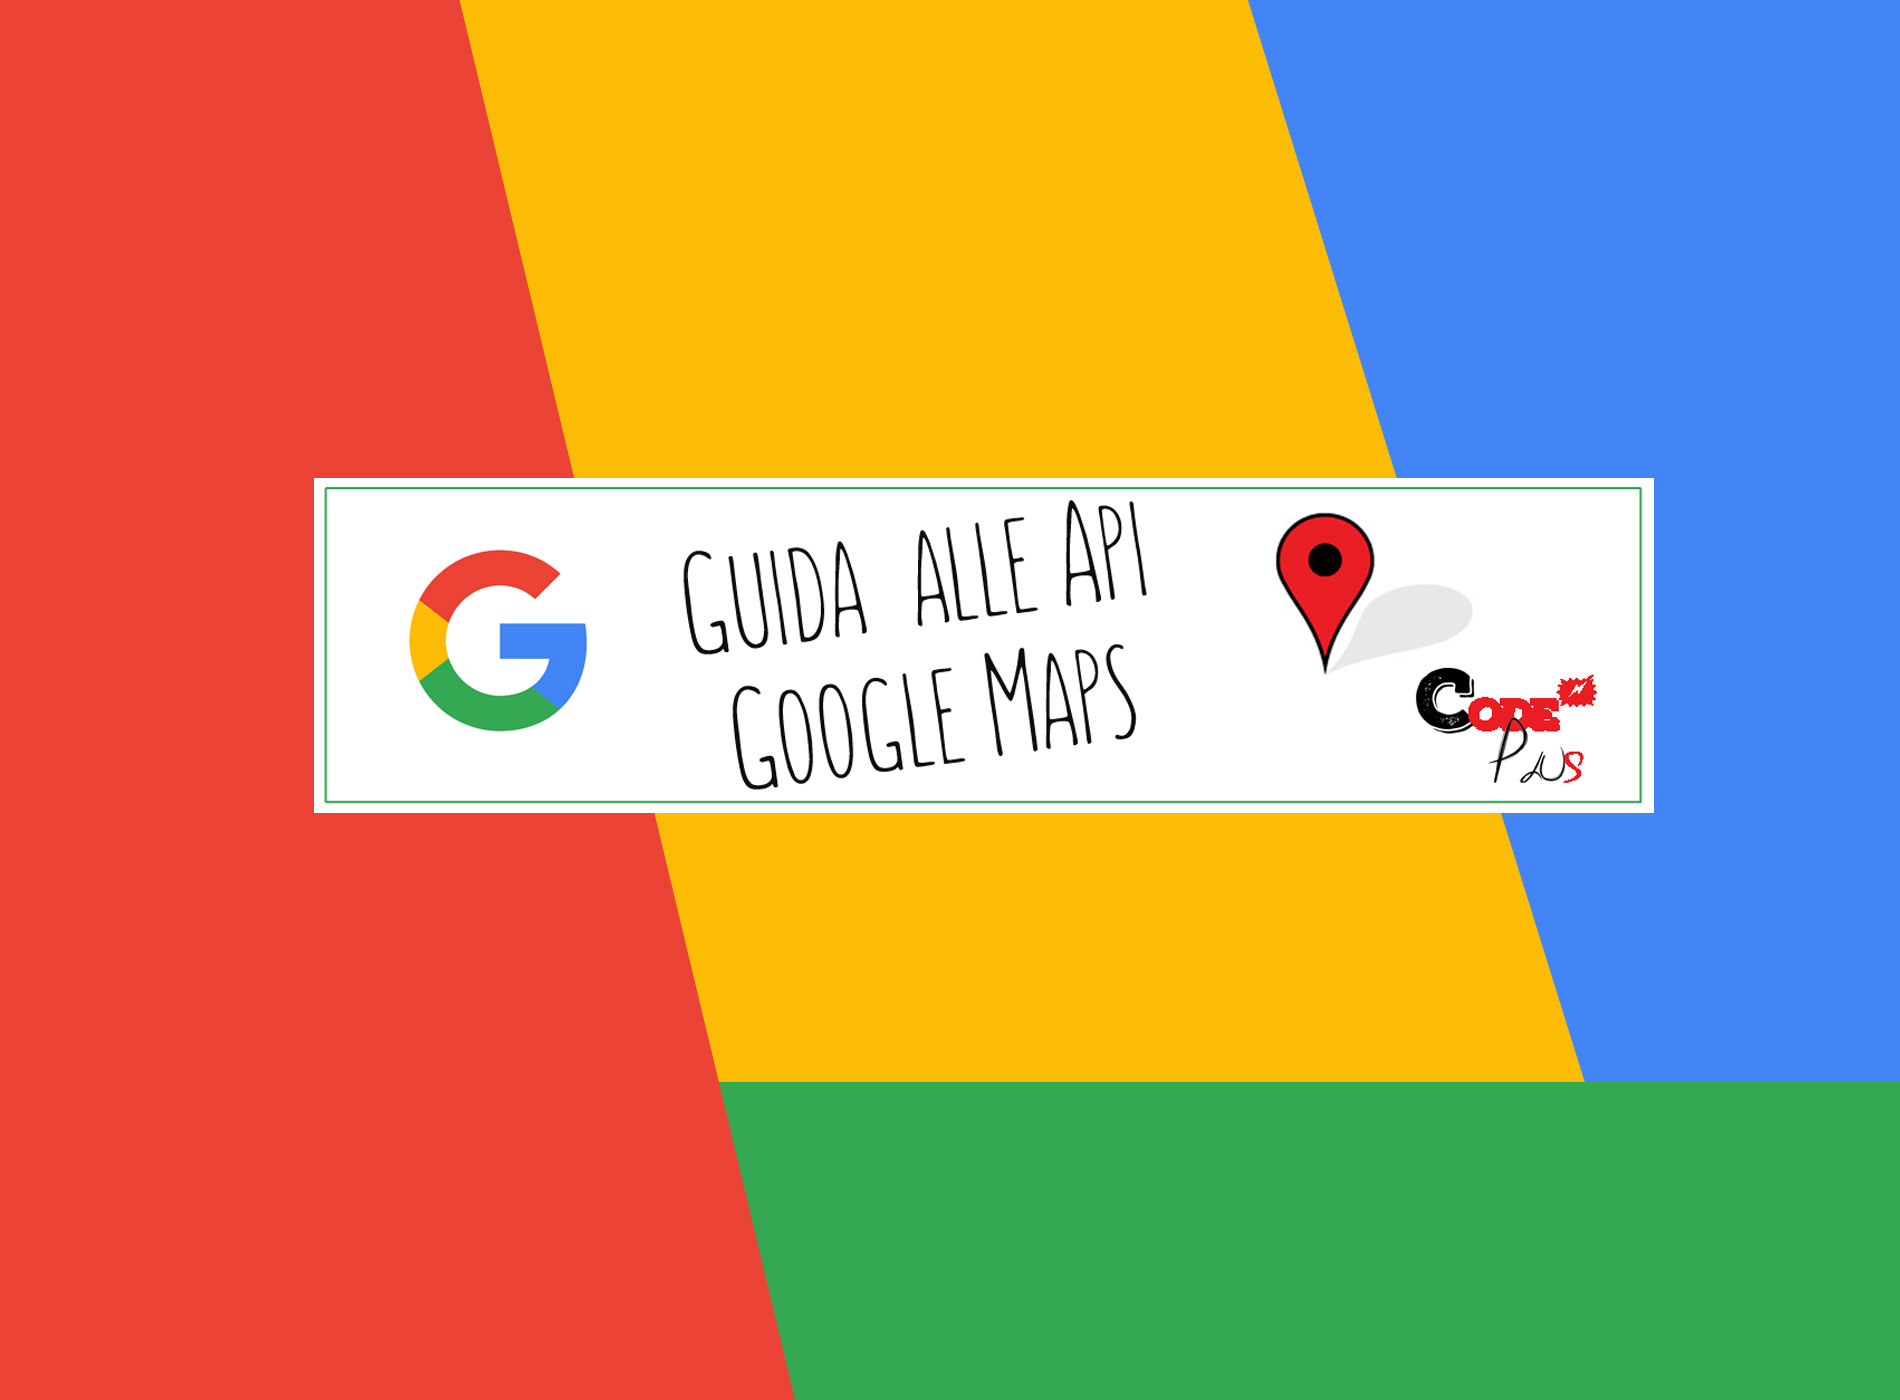 Guida alle Api Google Maps